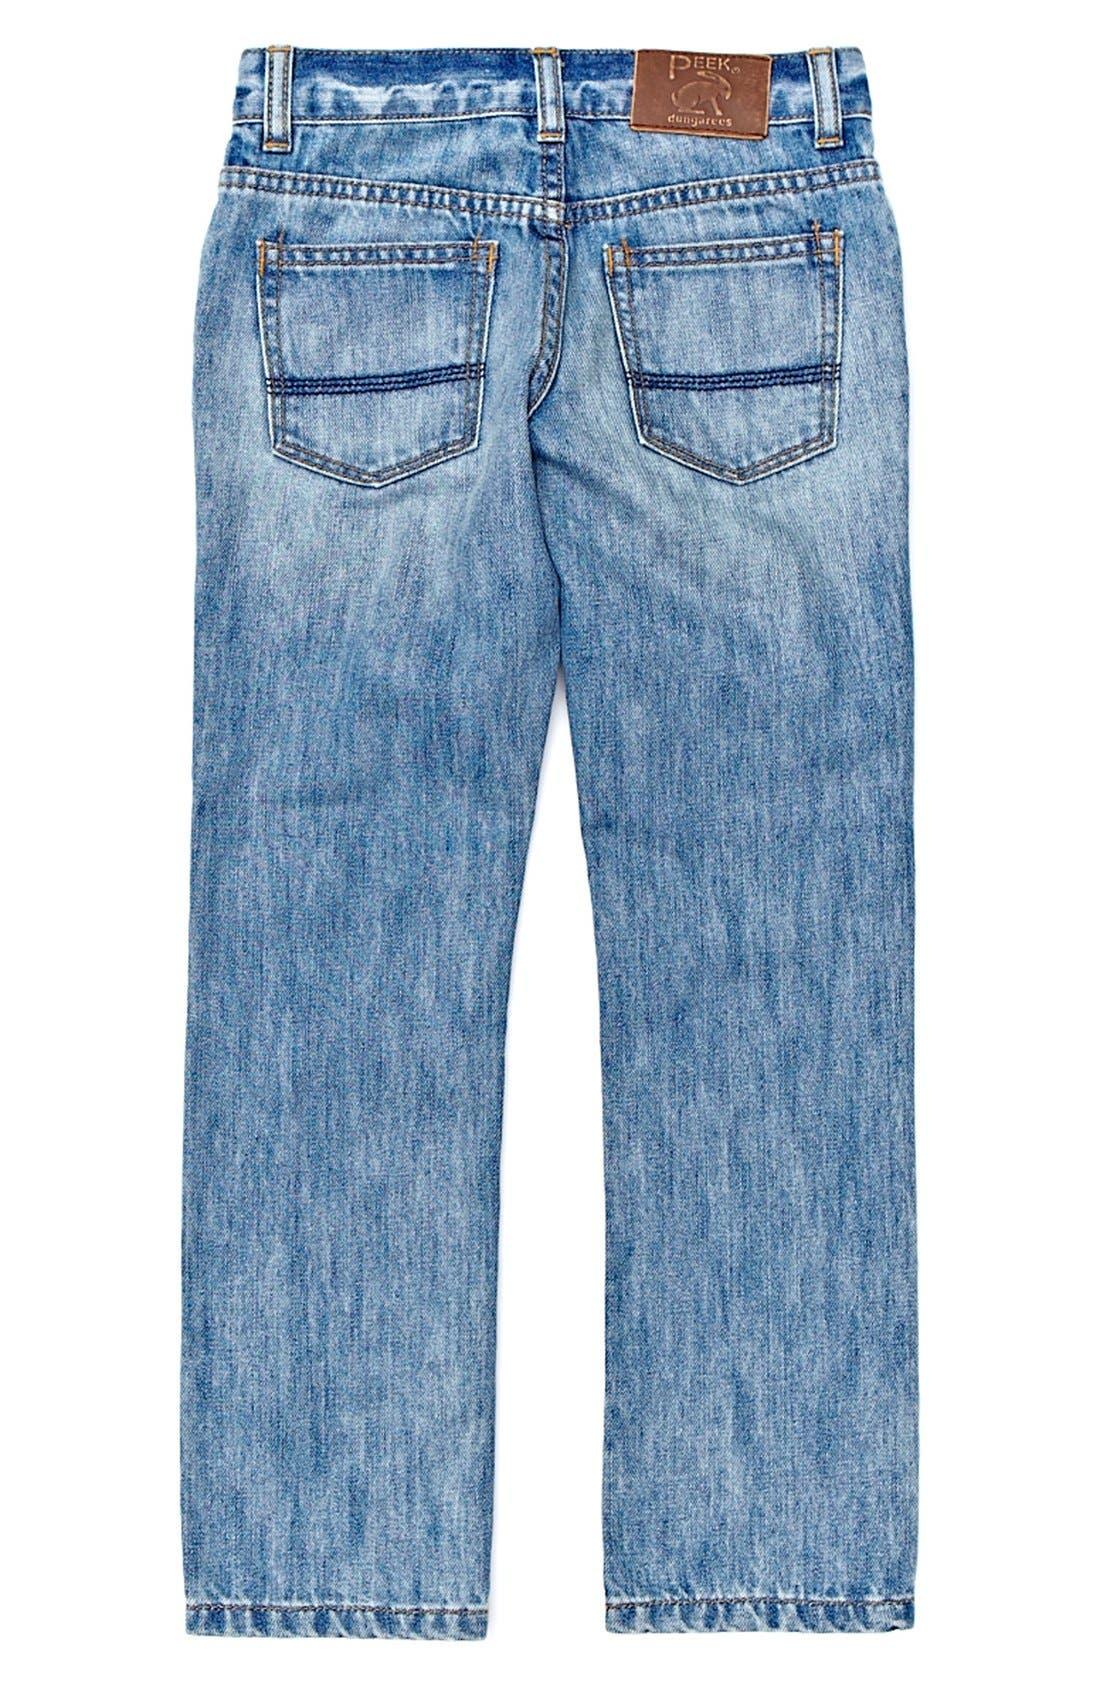 Alternate Image 1 Selected - Peek 'Slouch' Jeans (Big Boys)